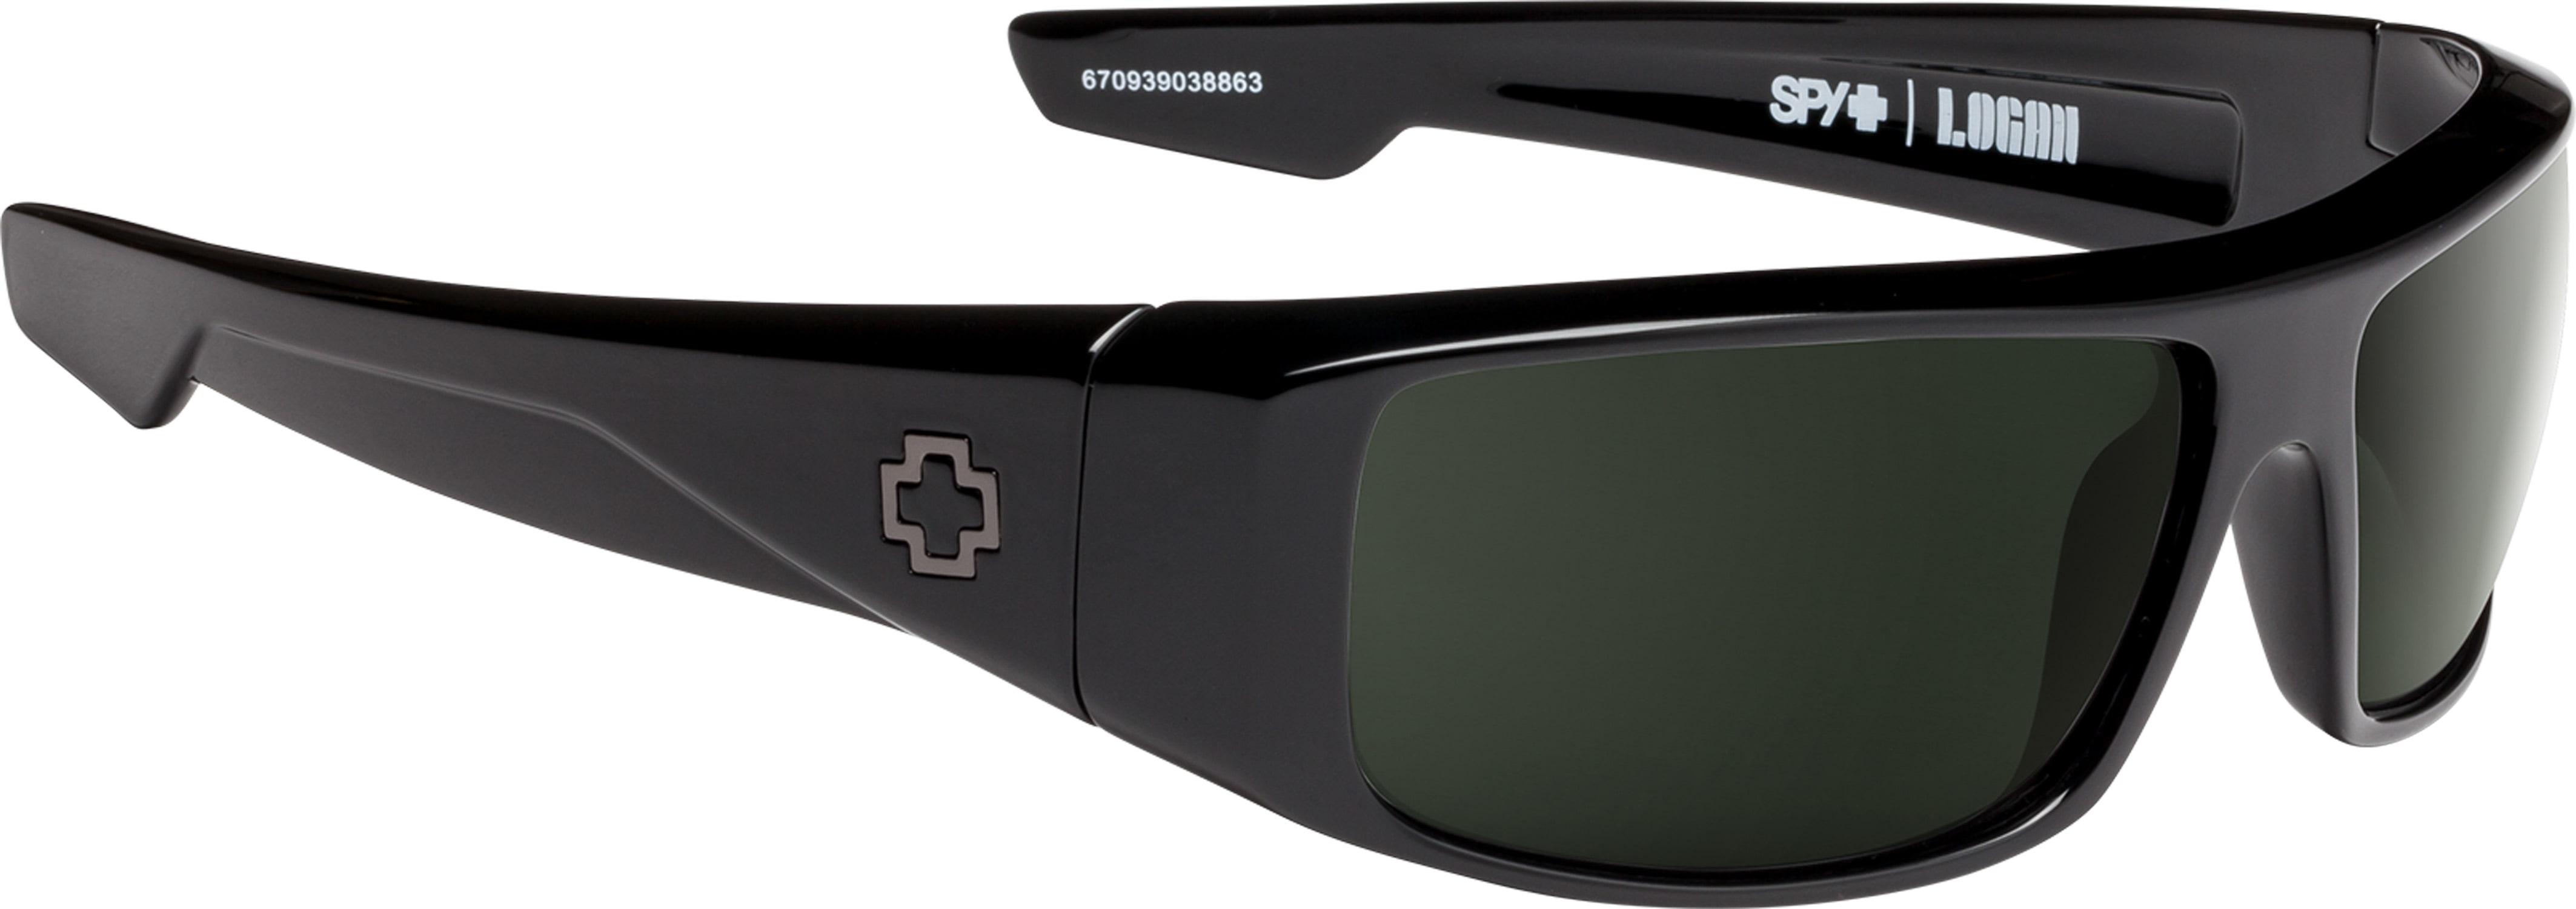 2f09b7423db Spy Logan Sunglasses Lenses